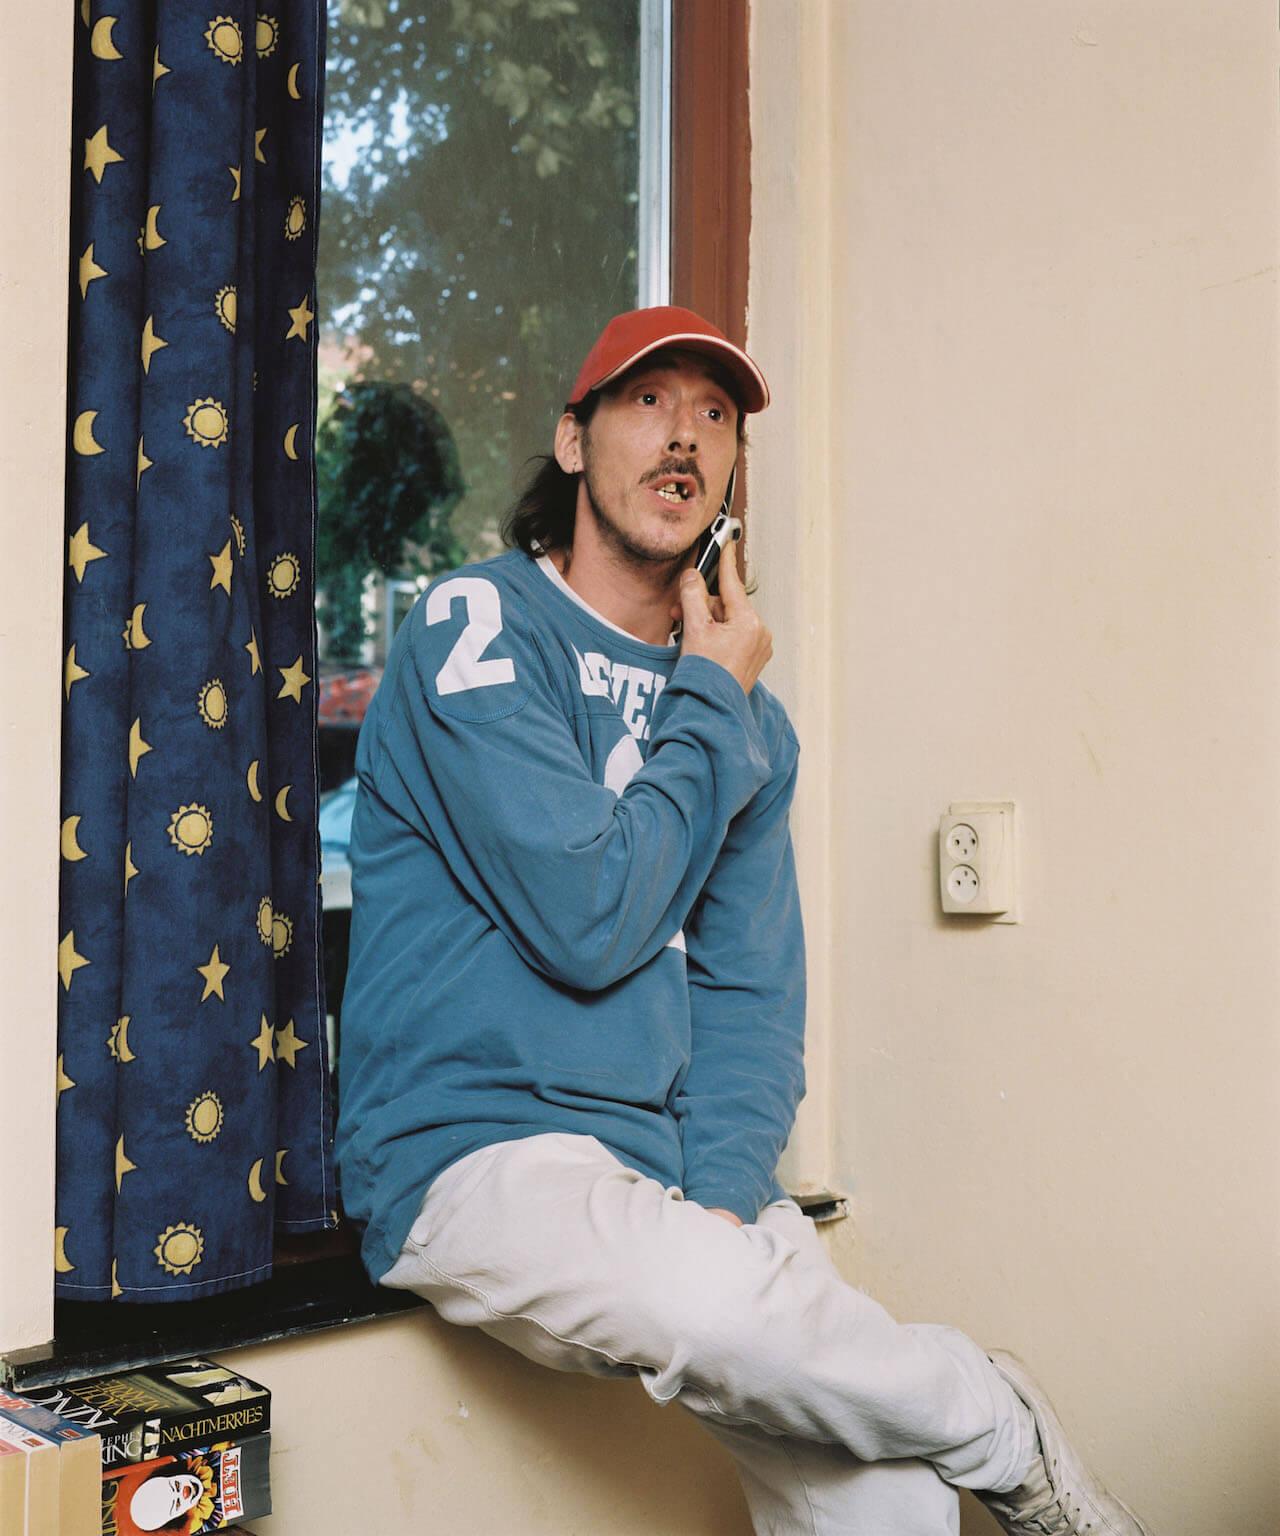 Man Next Door. Fotografía: Ron Hornstra